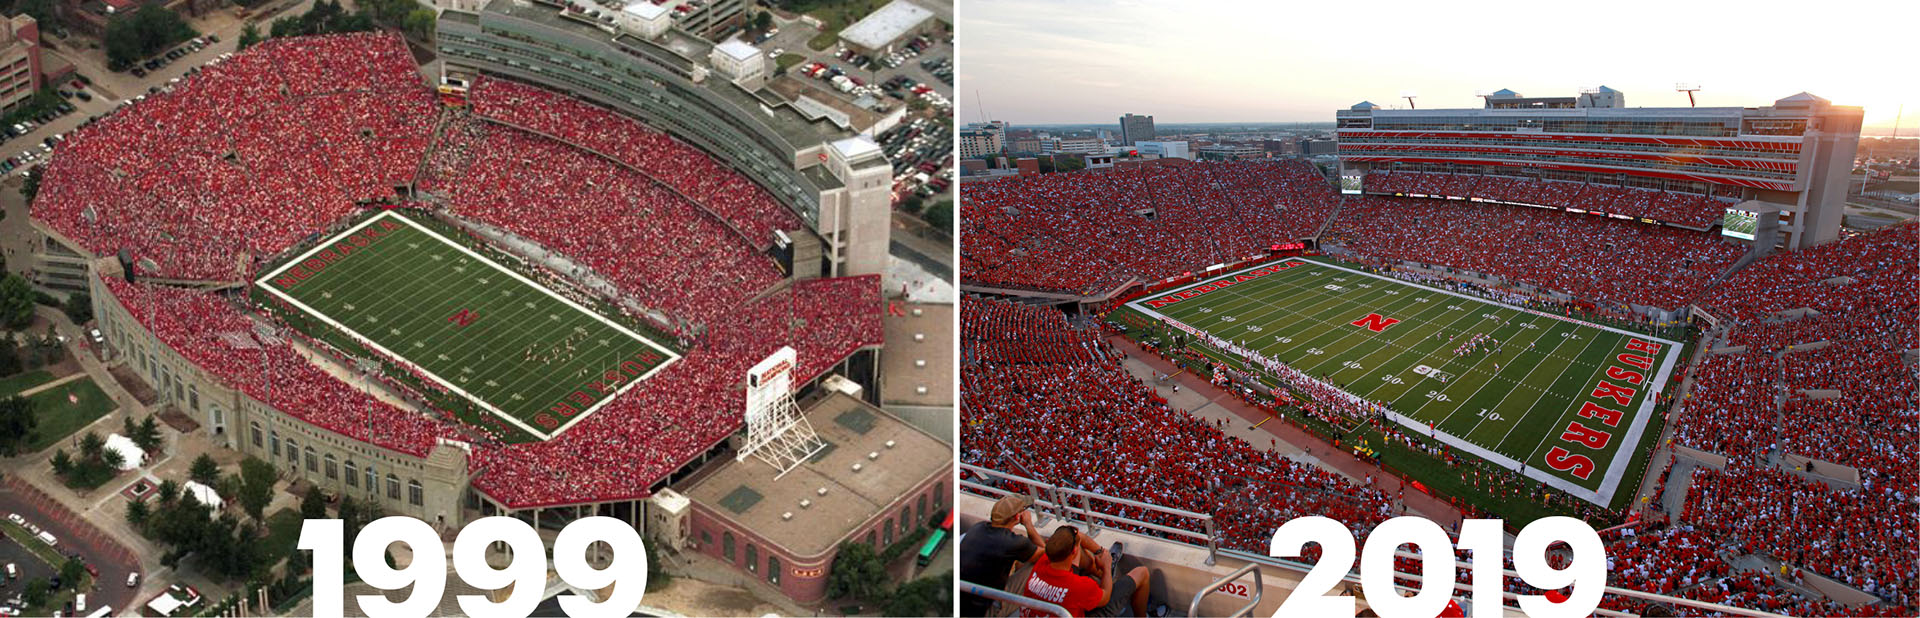 Celebrating 20 Years at Nebraska's Memorial Stadium - FieldTurf